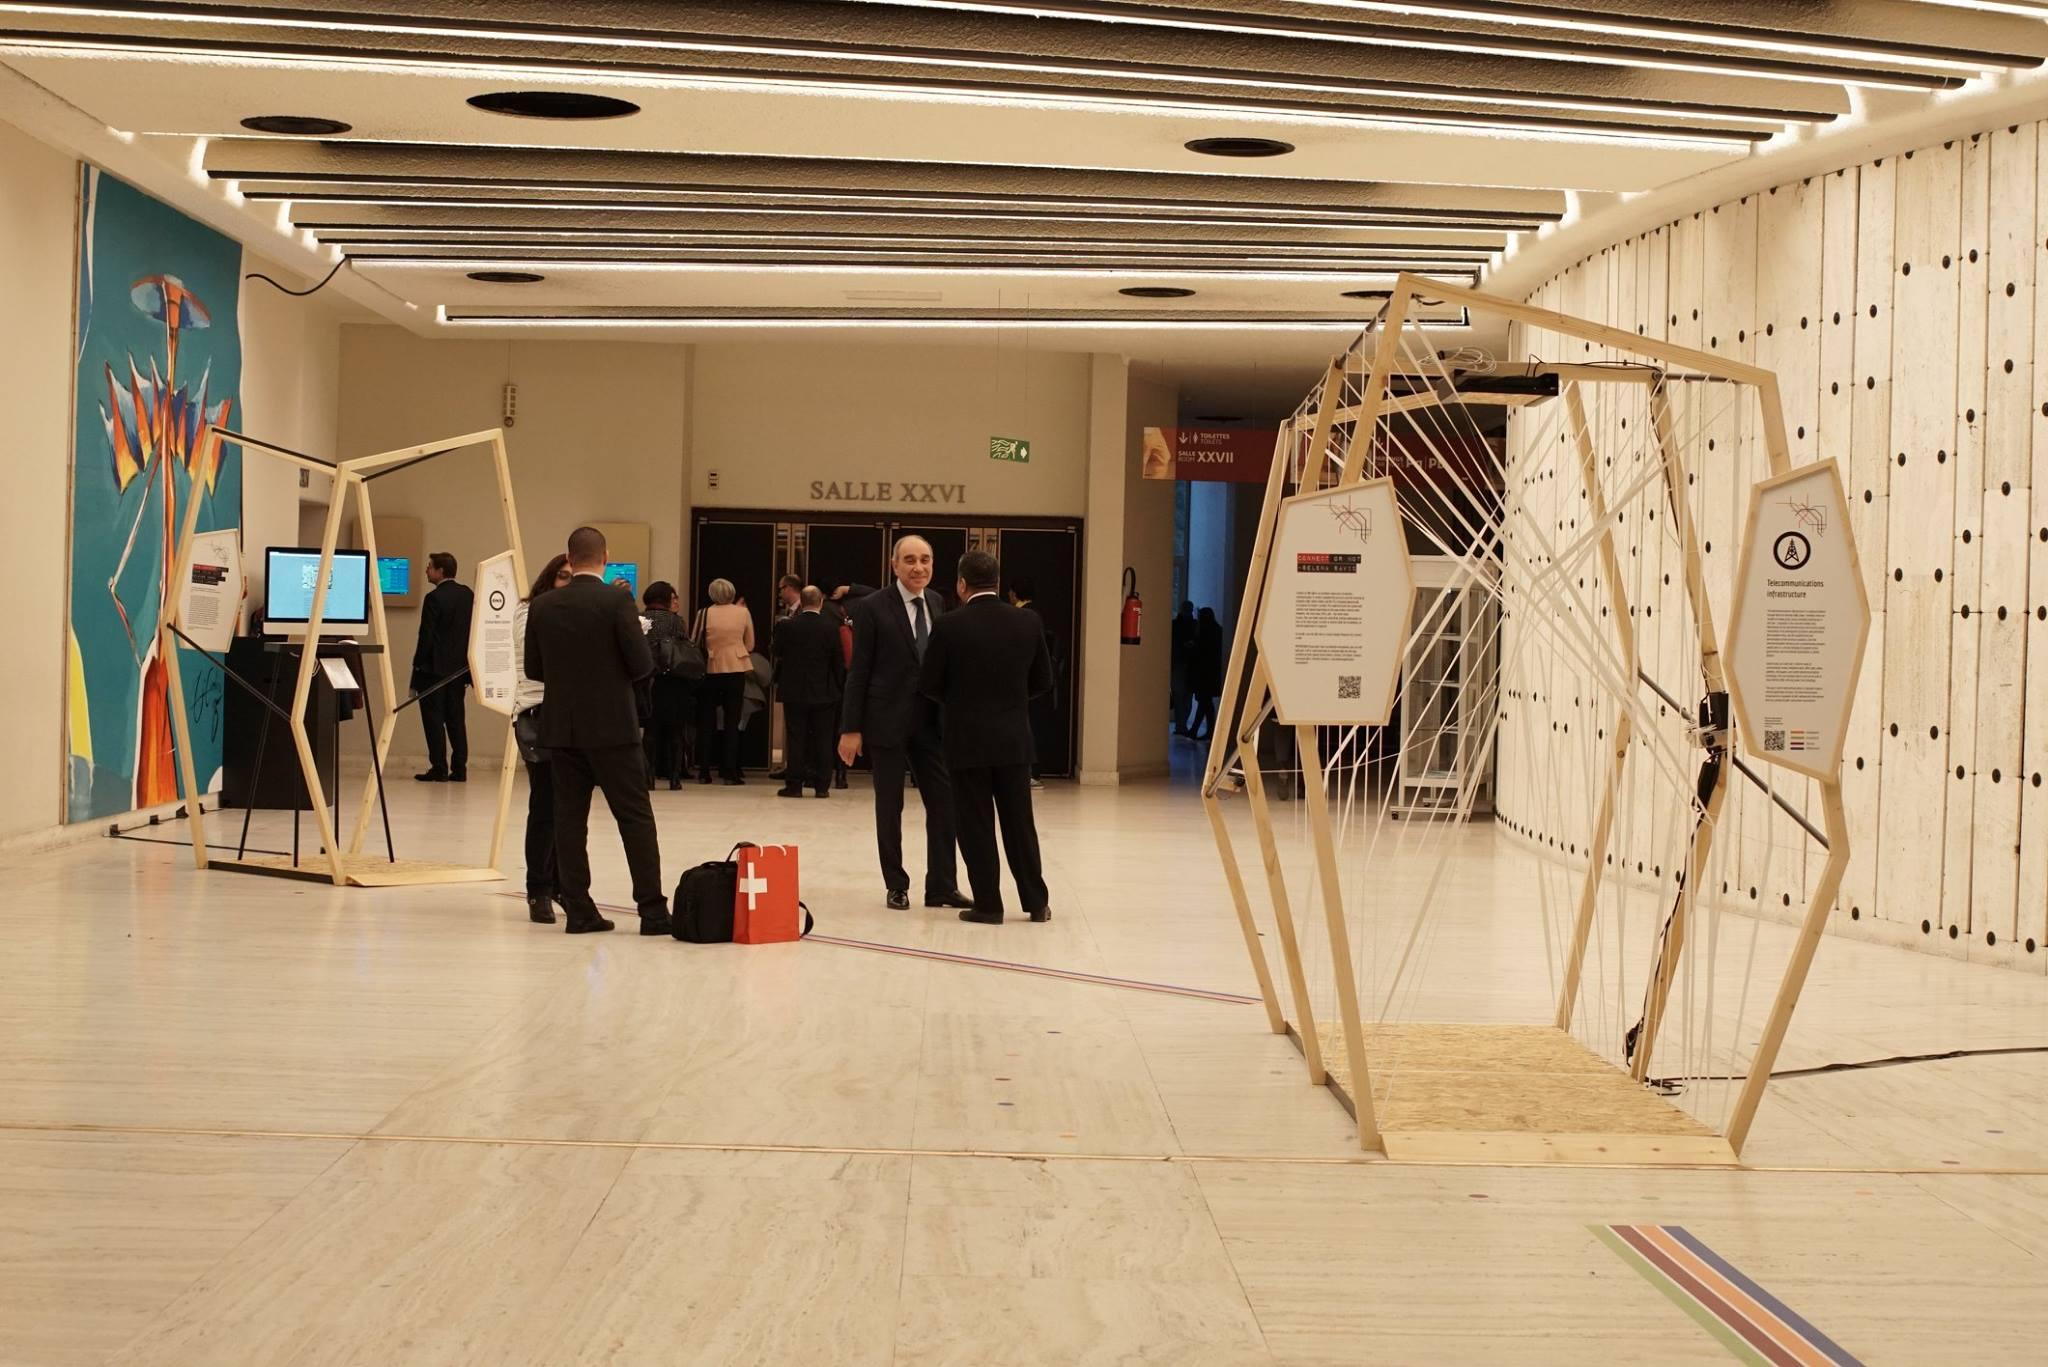 ART@IGF exhibition at the Internet Governance Forum 2017 Geneva